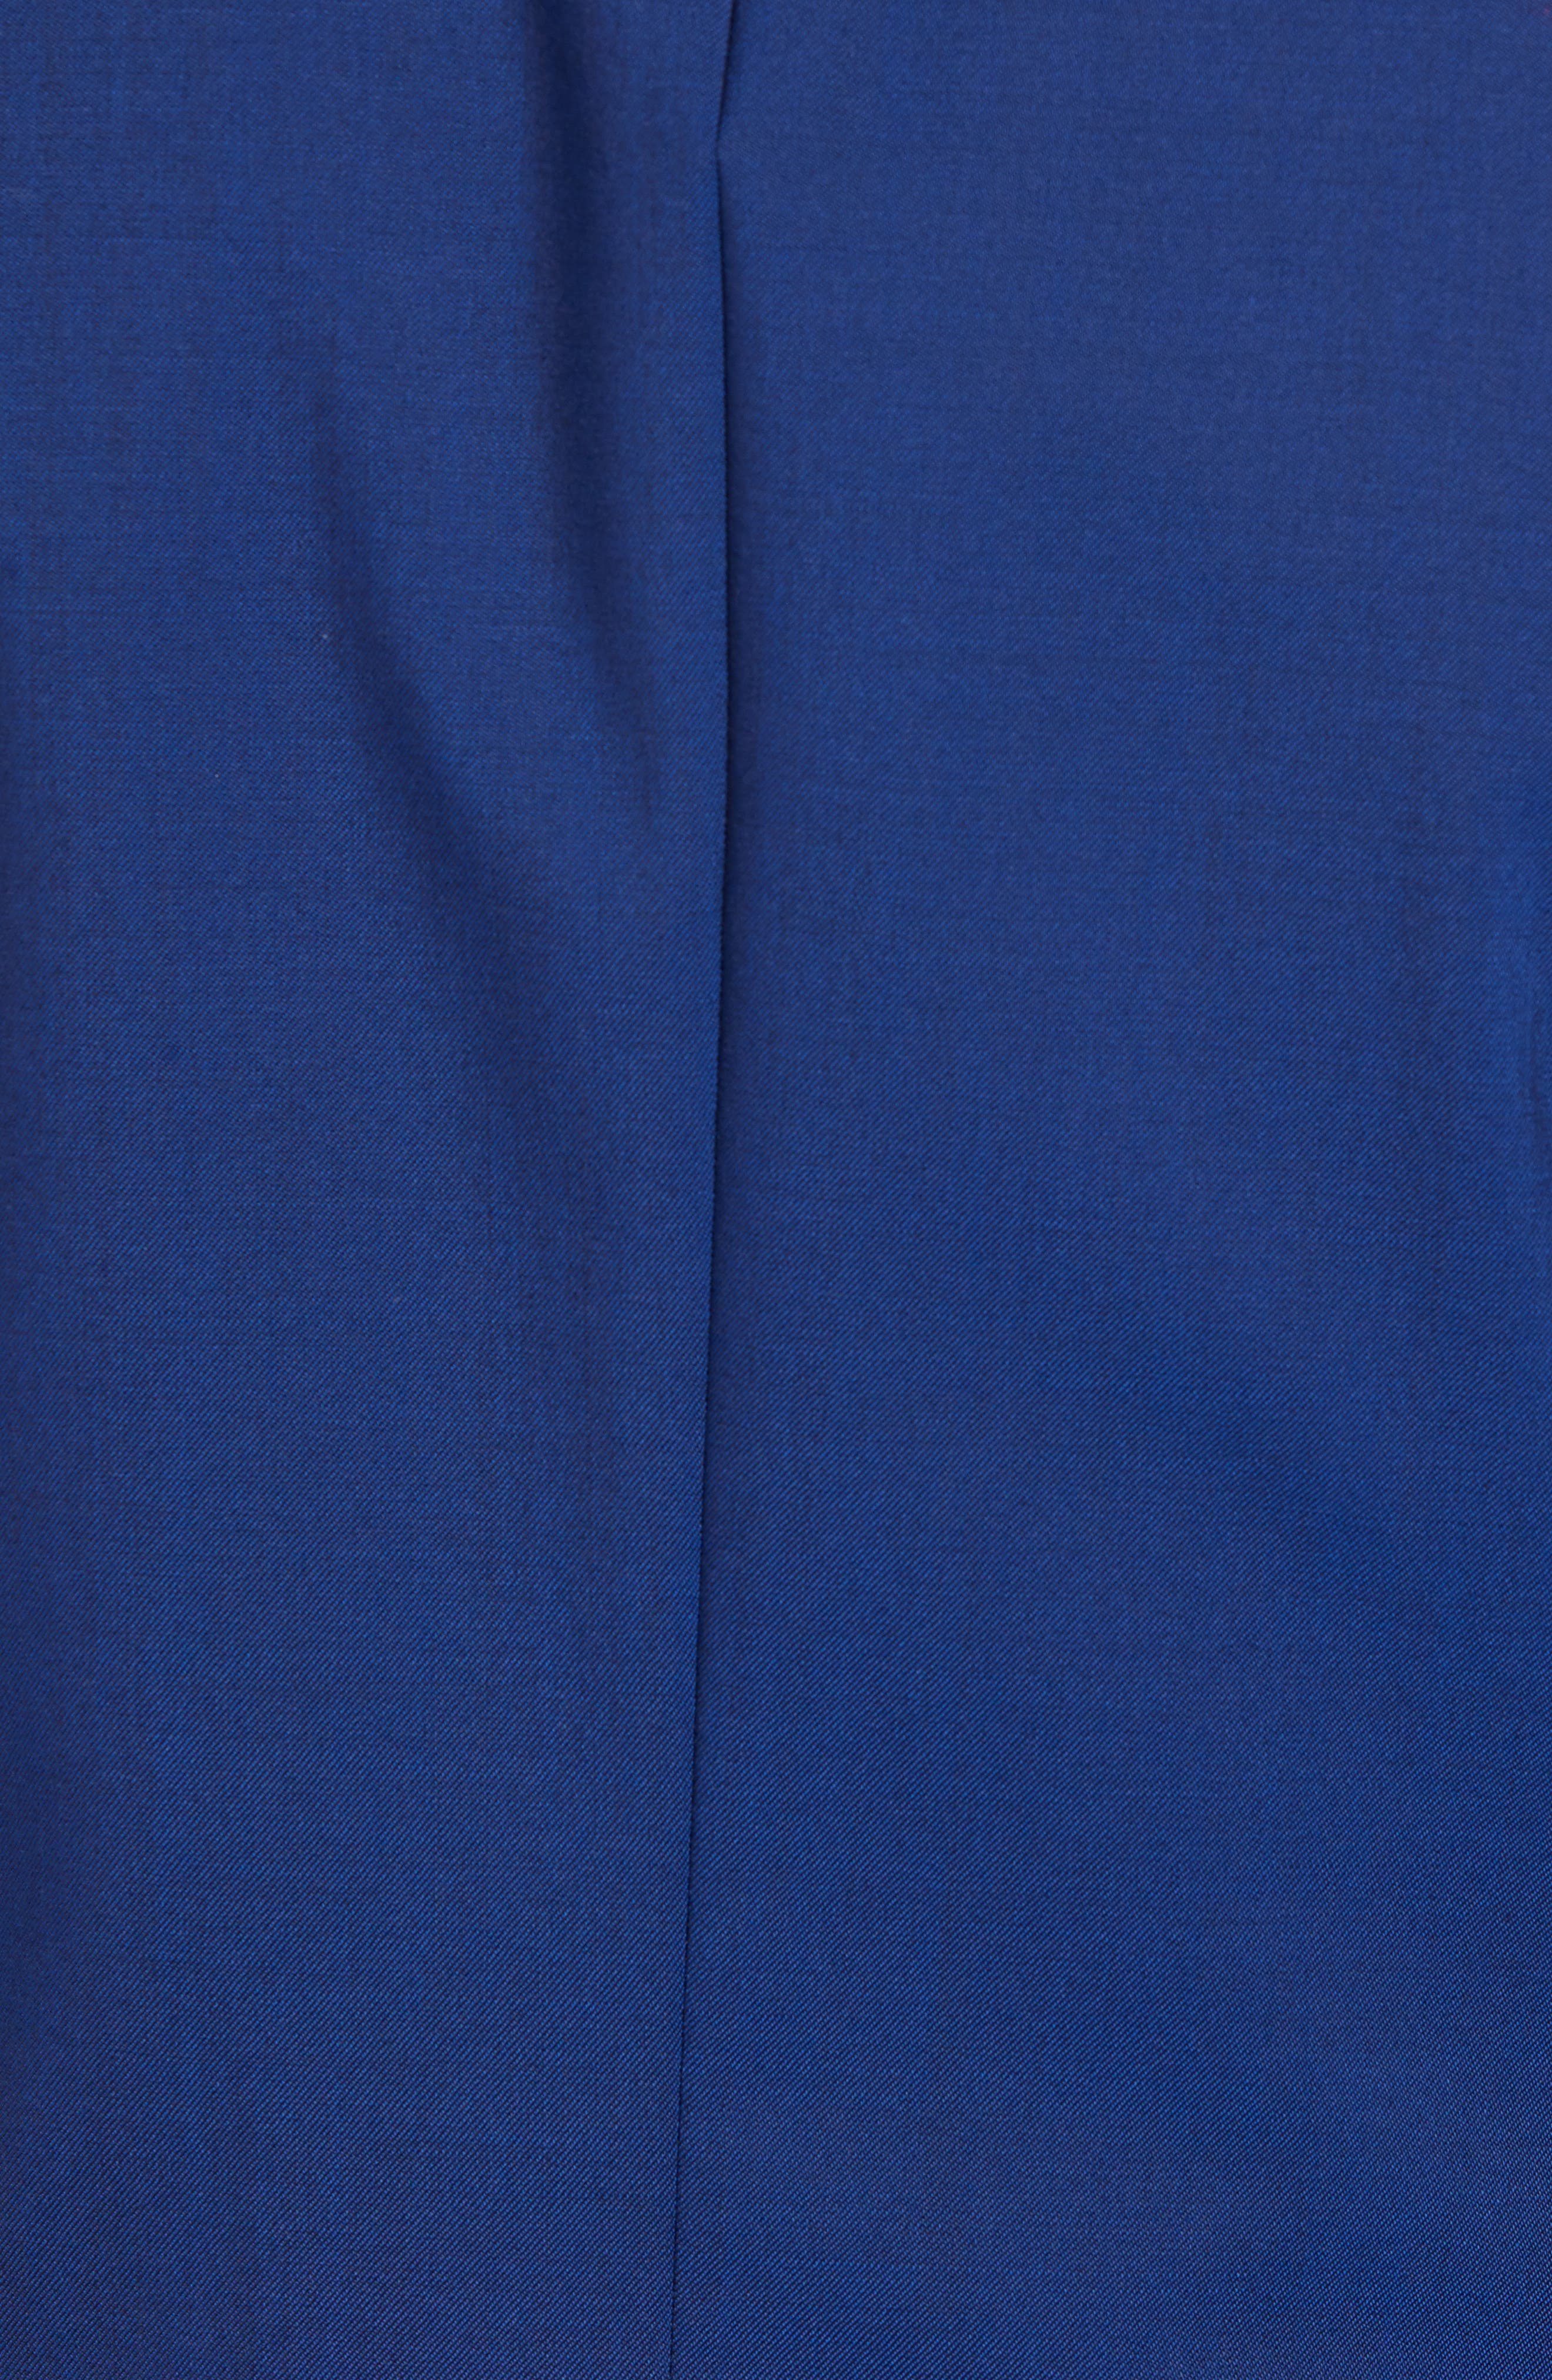 Jetsetter Slim Fit Stretch Wool Blazer,                             Alternate thumbnail 6, color,                             BRILLIANT NAVY